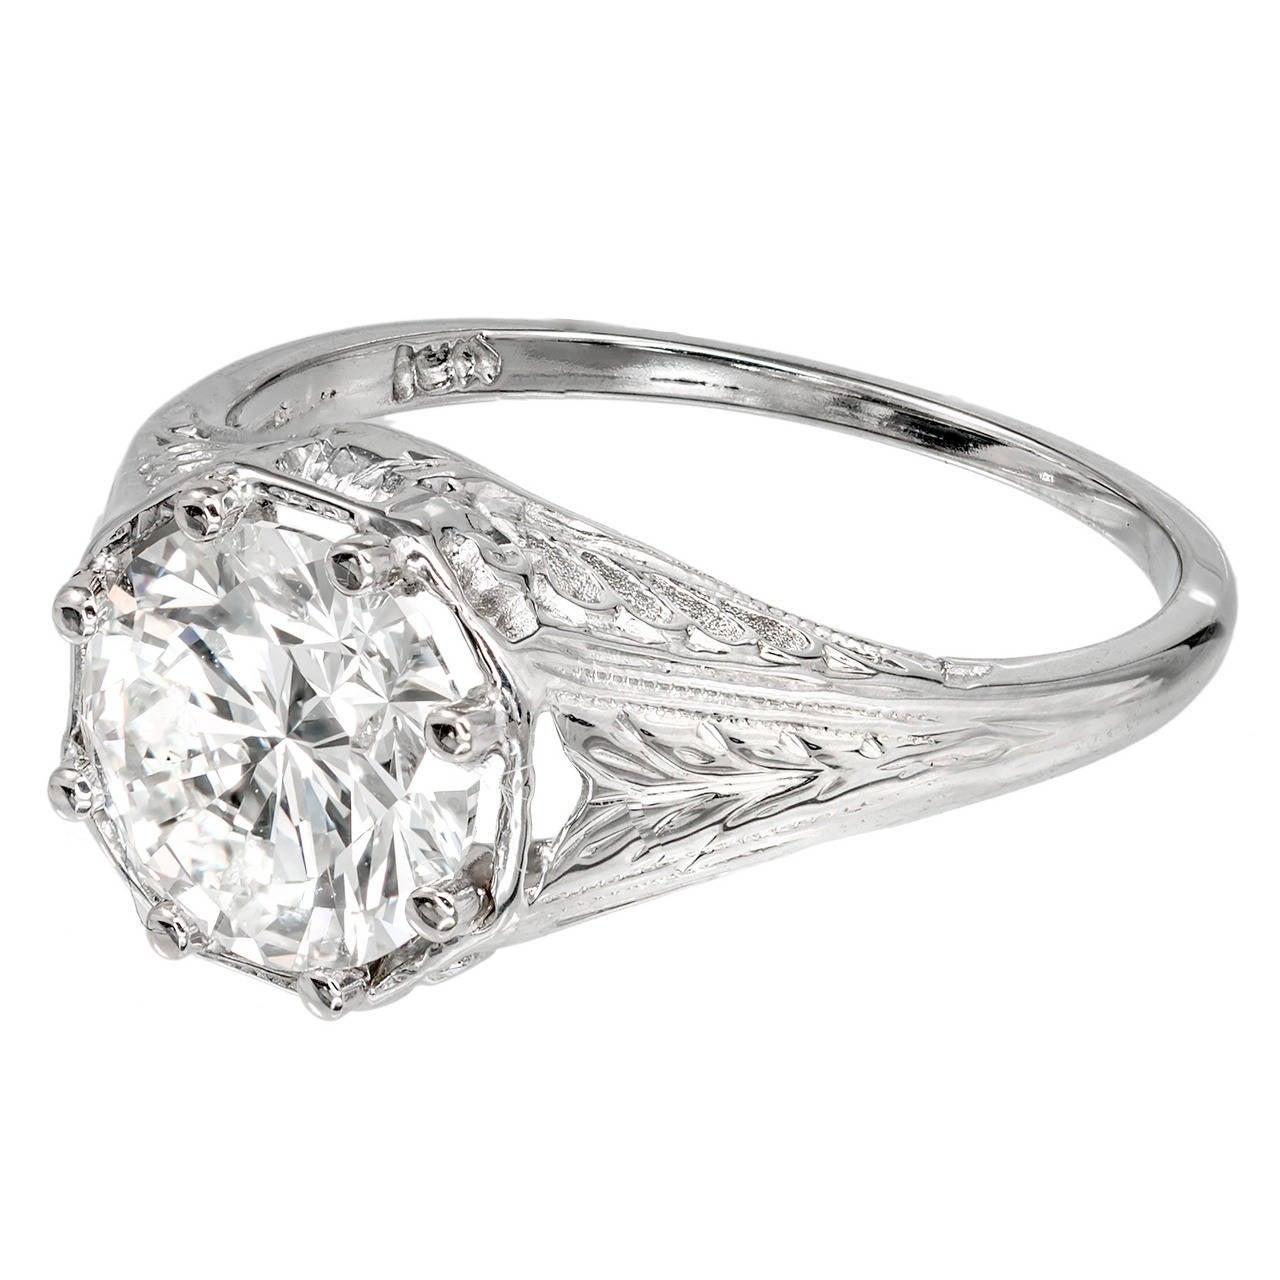 Transitional Cut Diamond Value